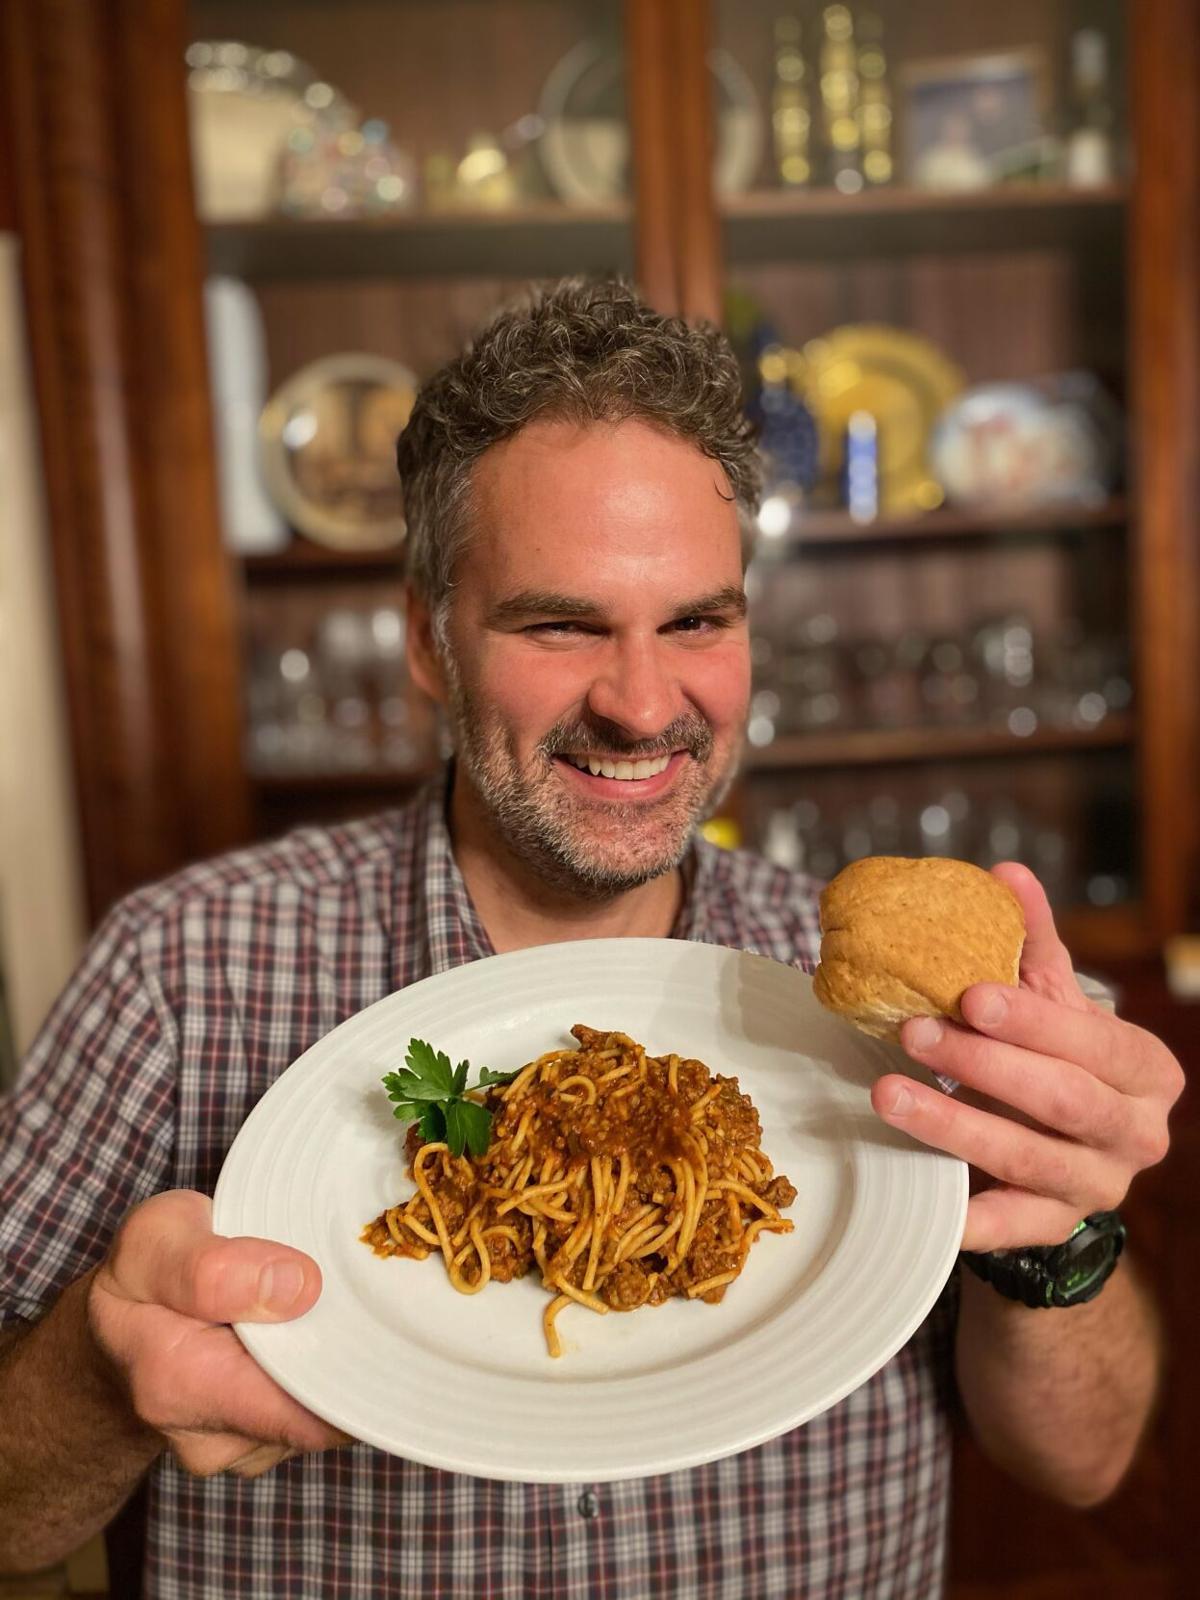 Jason spaghetti.JPG